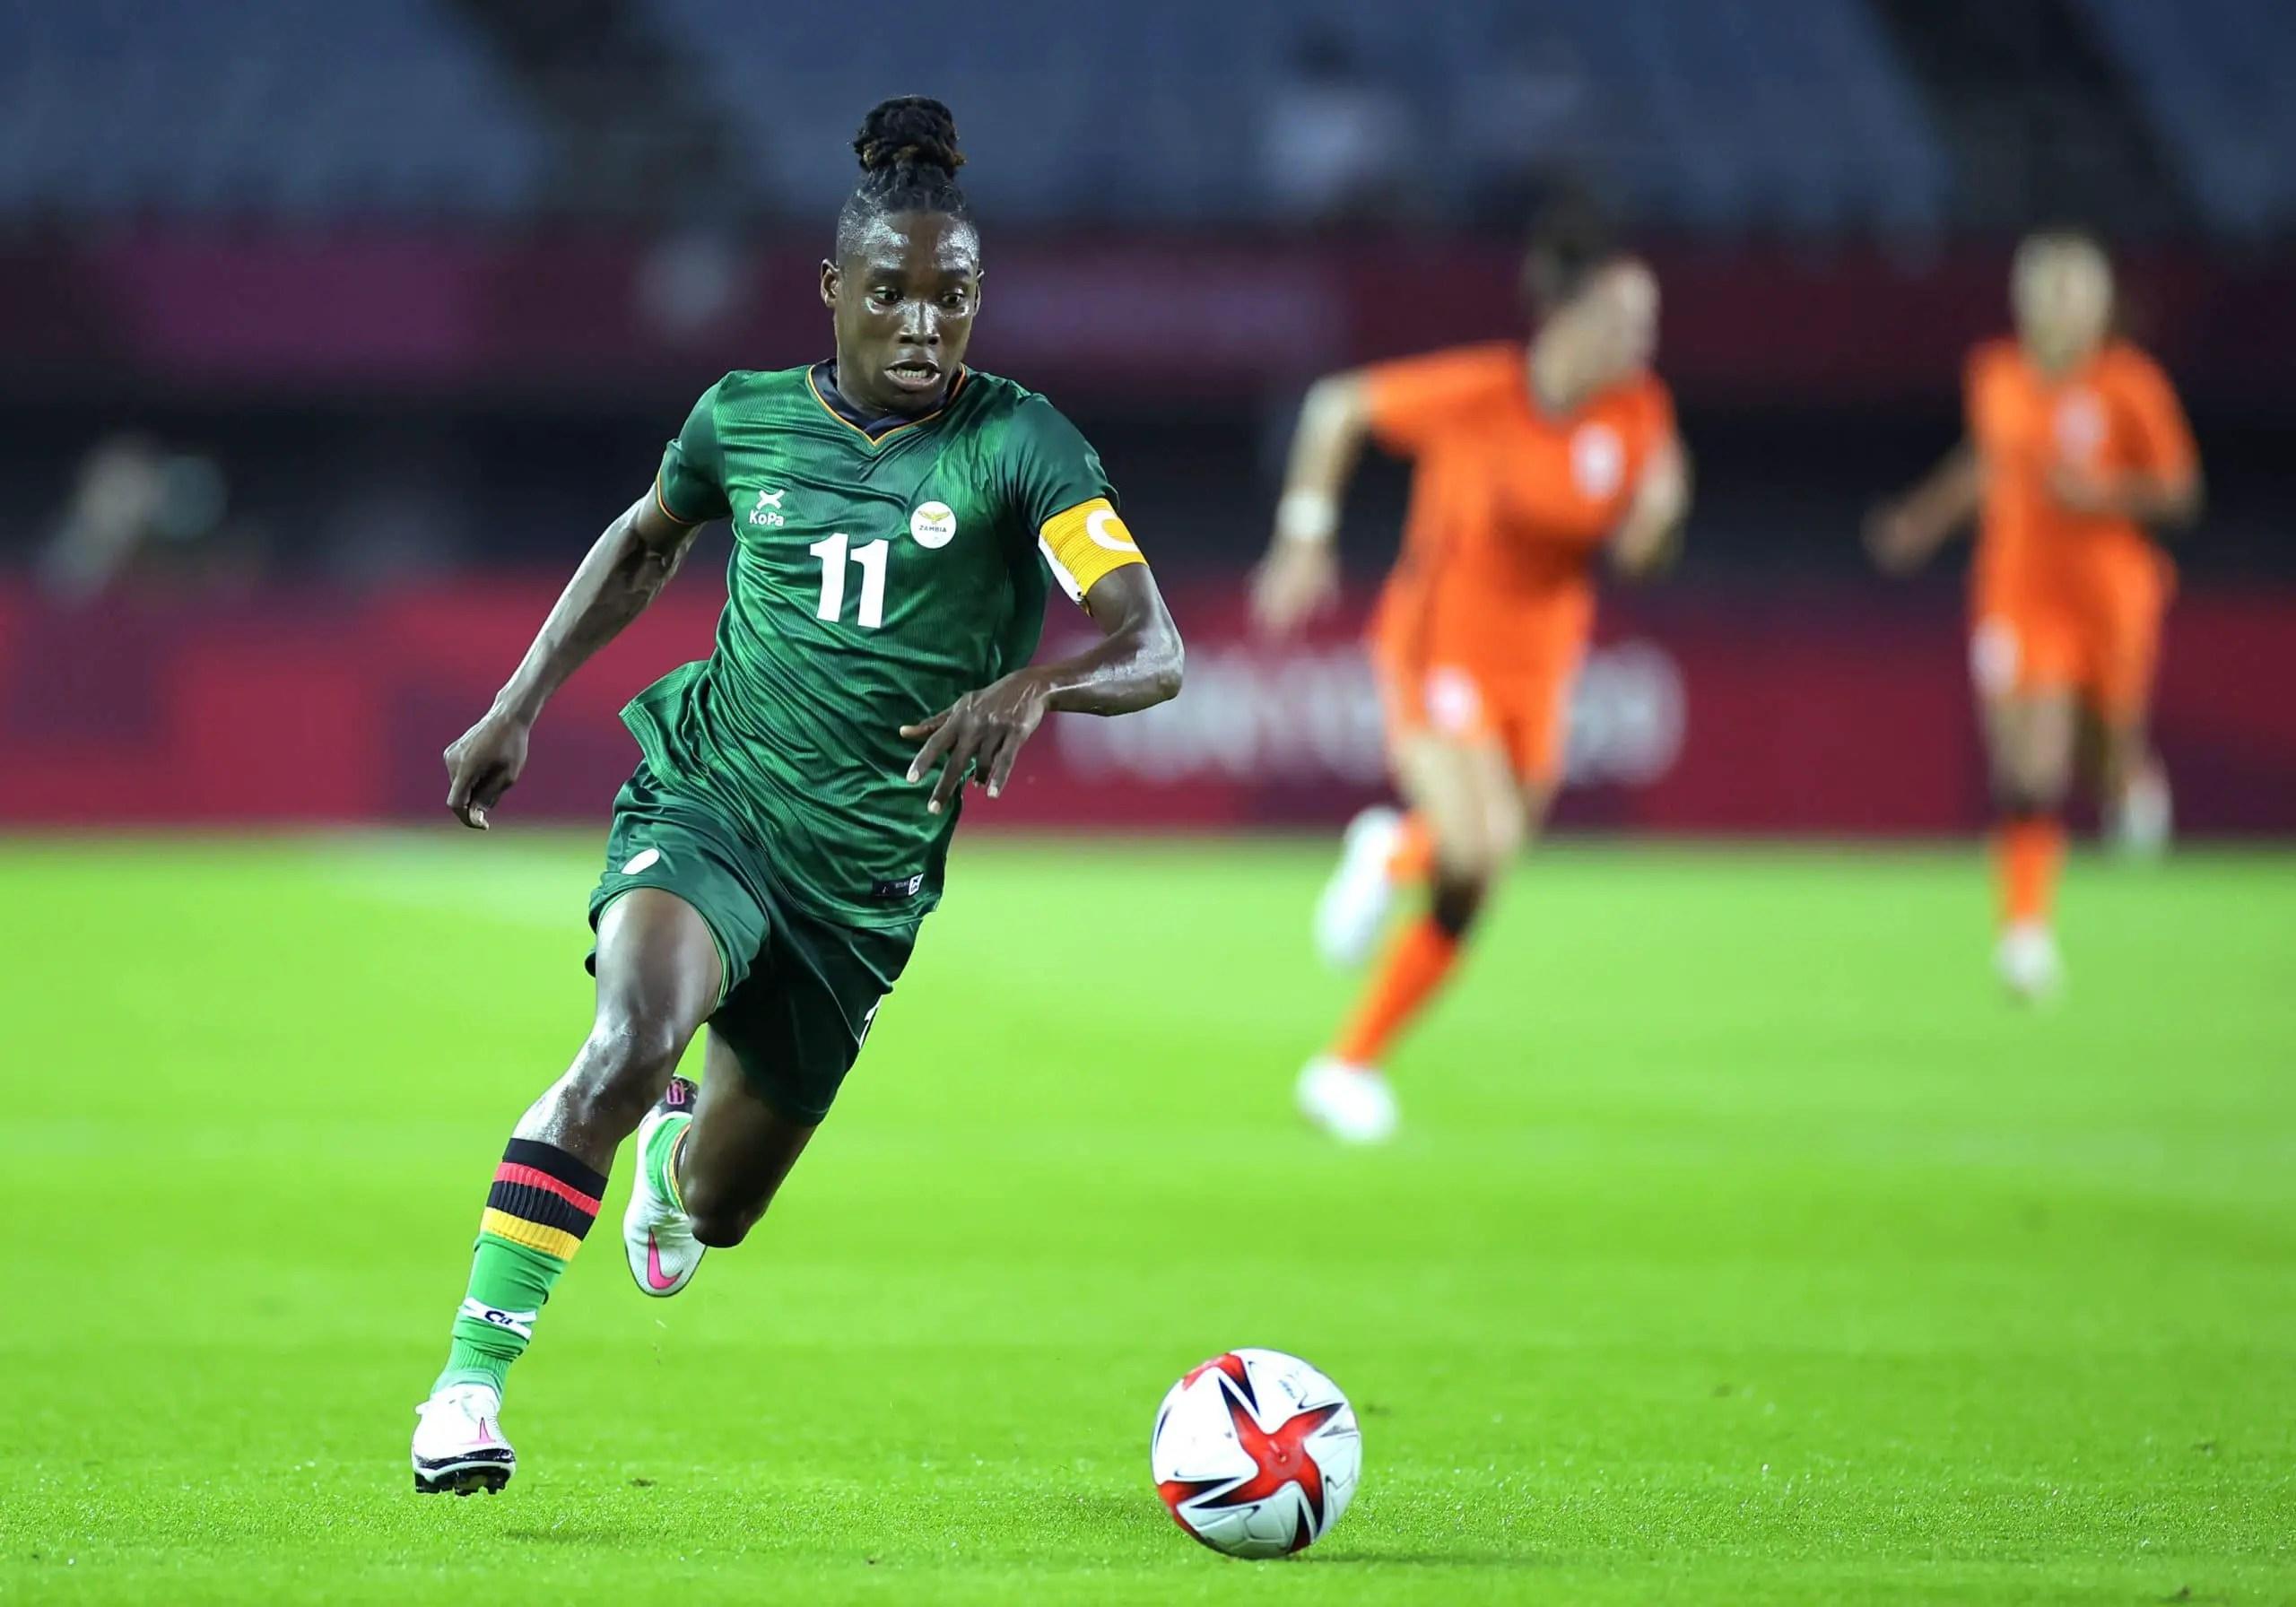 Tokyo 2020 Football: Zambia's Banda Makes Olympic History In 10-3 Loss To Netherlands